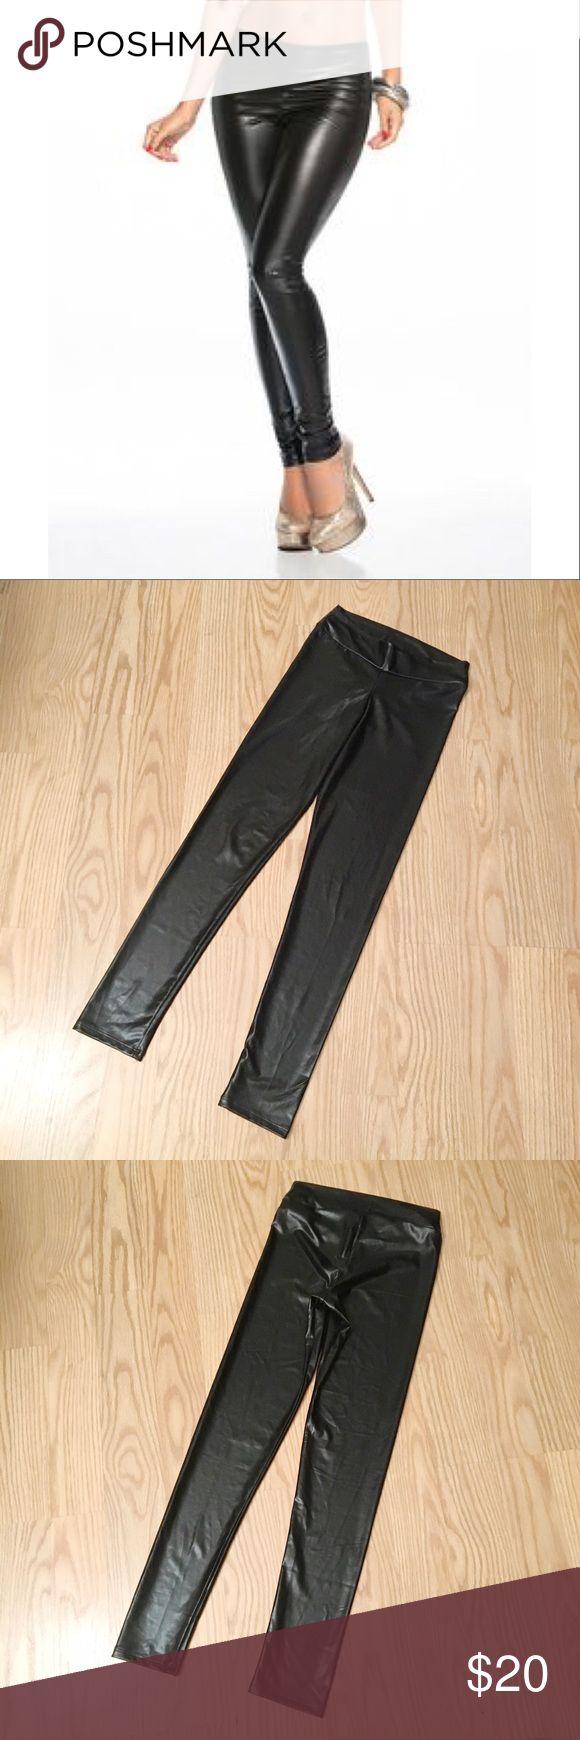 "NWOT AM PM ESPIRAL Wetlook leggings NWOT AM PM BY ESPIRAL black wetlook leggings | size S | inseam is 29"" espiral Pants Leggings"